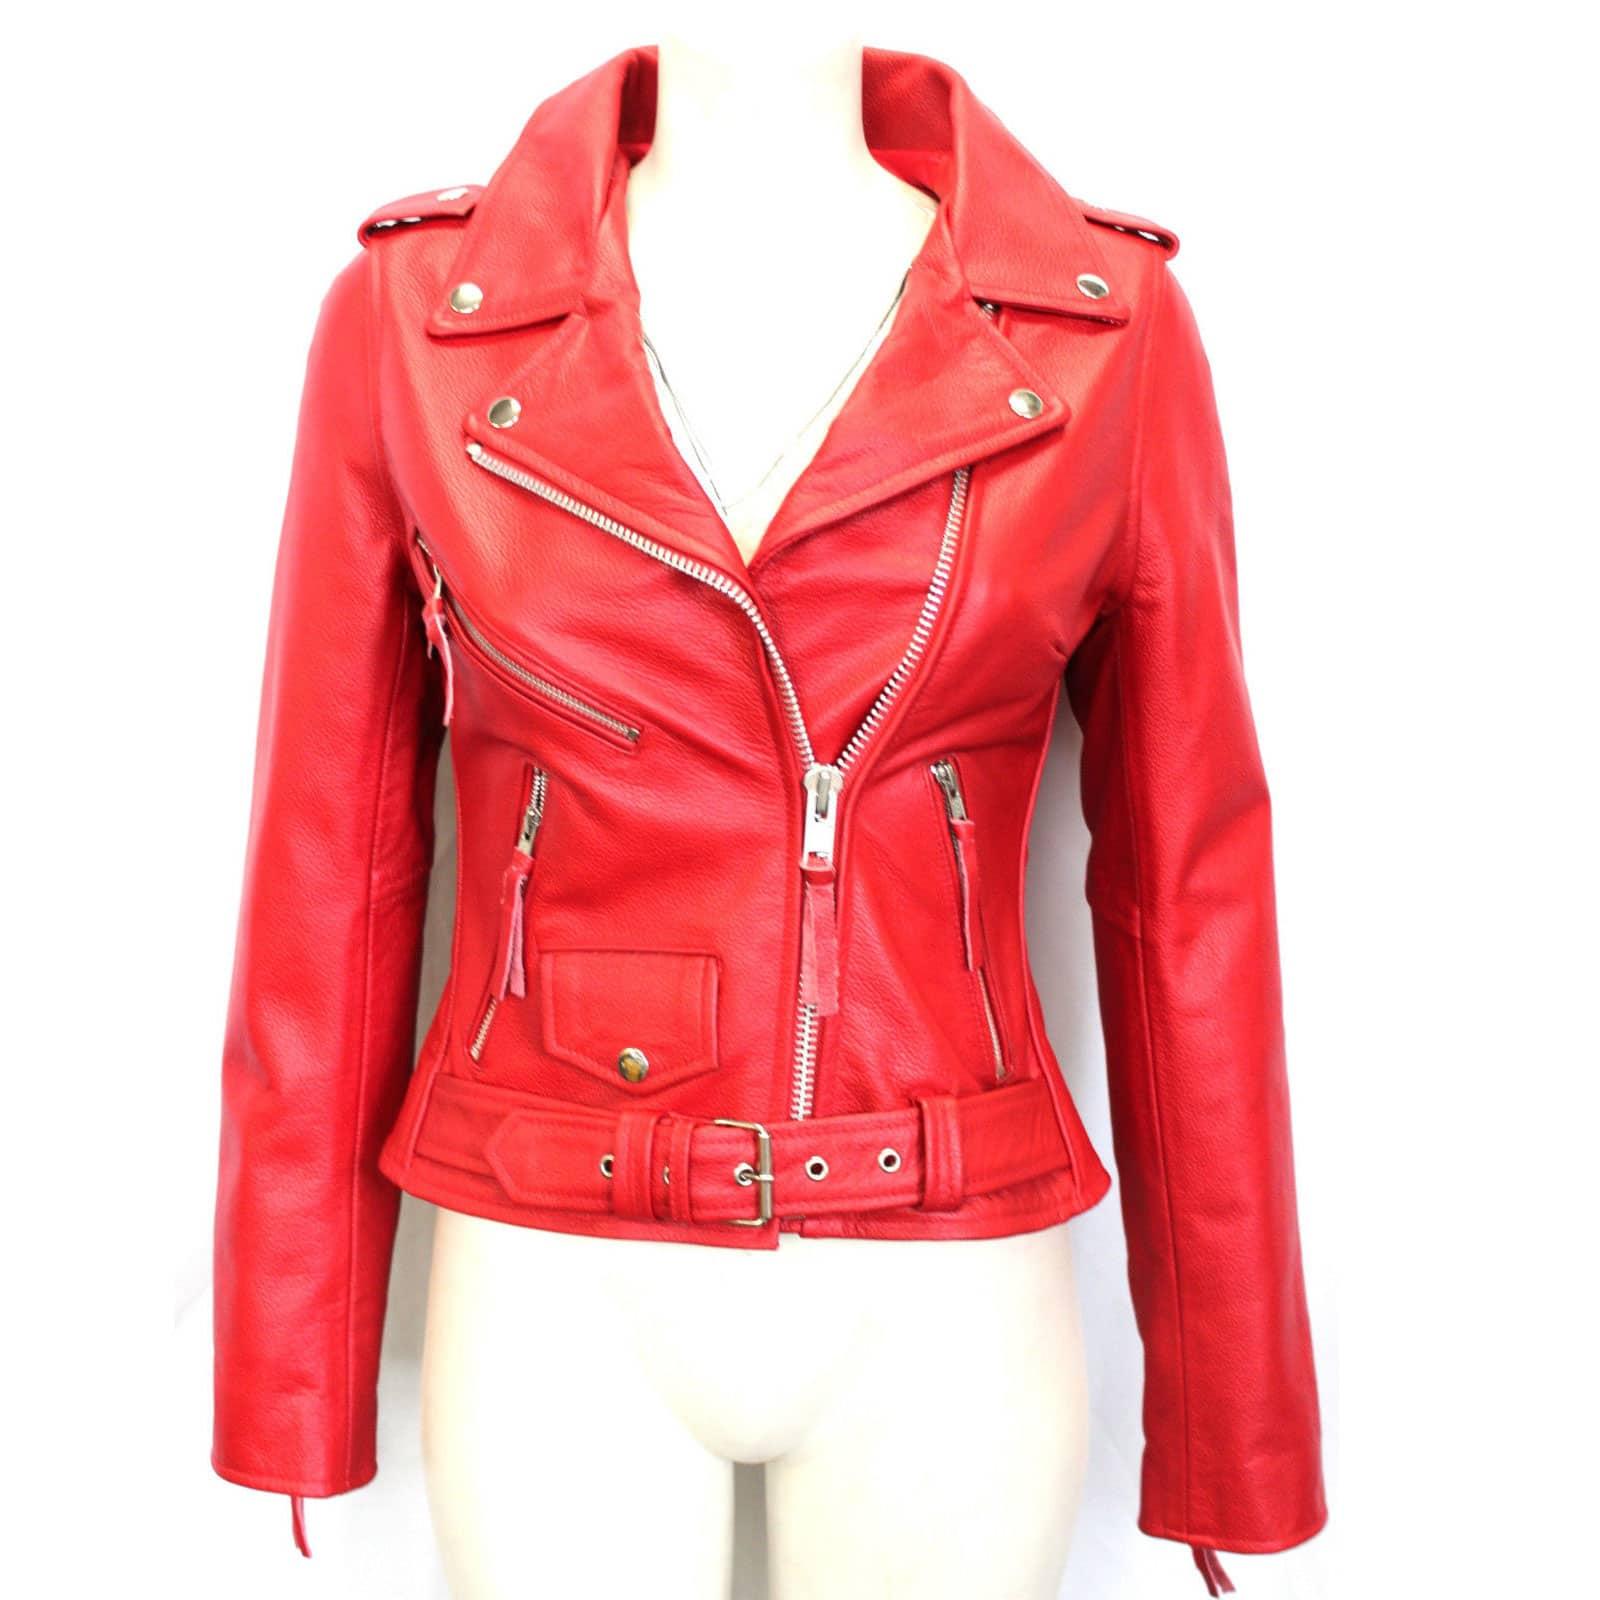 biker red leather jacket for women made to measure jacket kilt